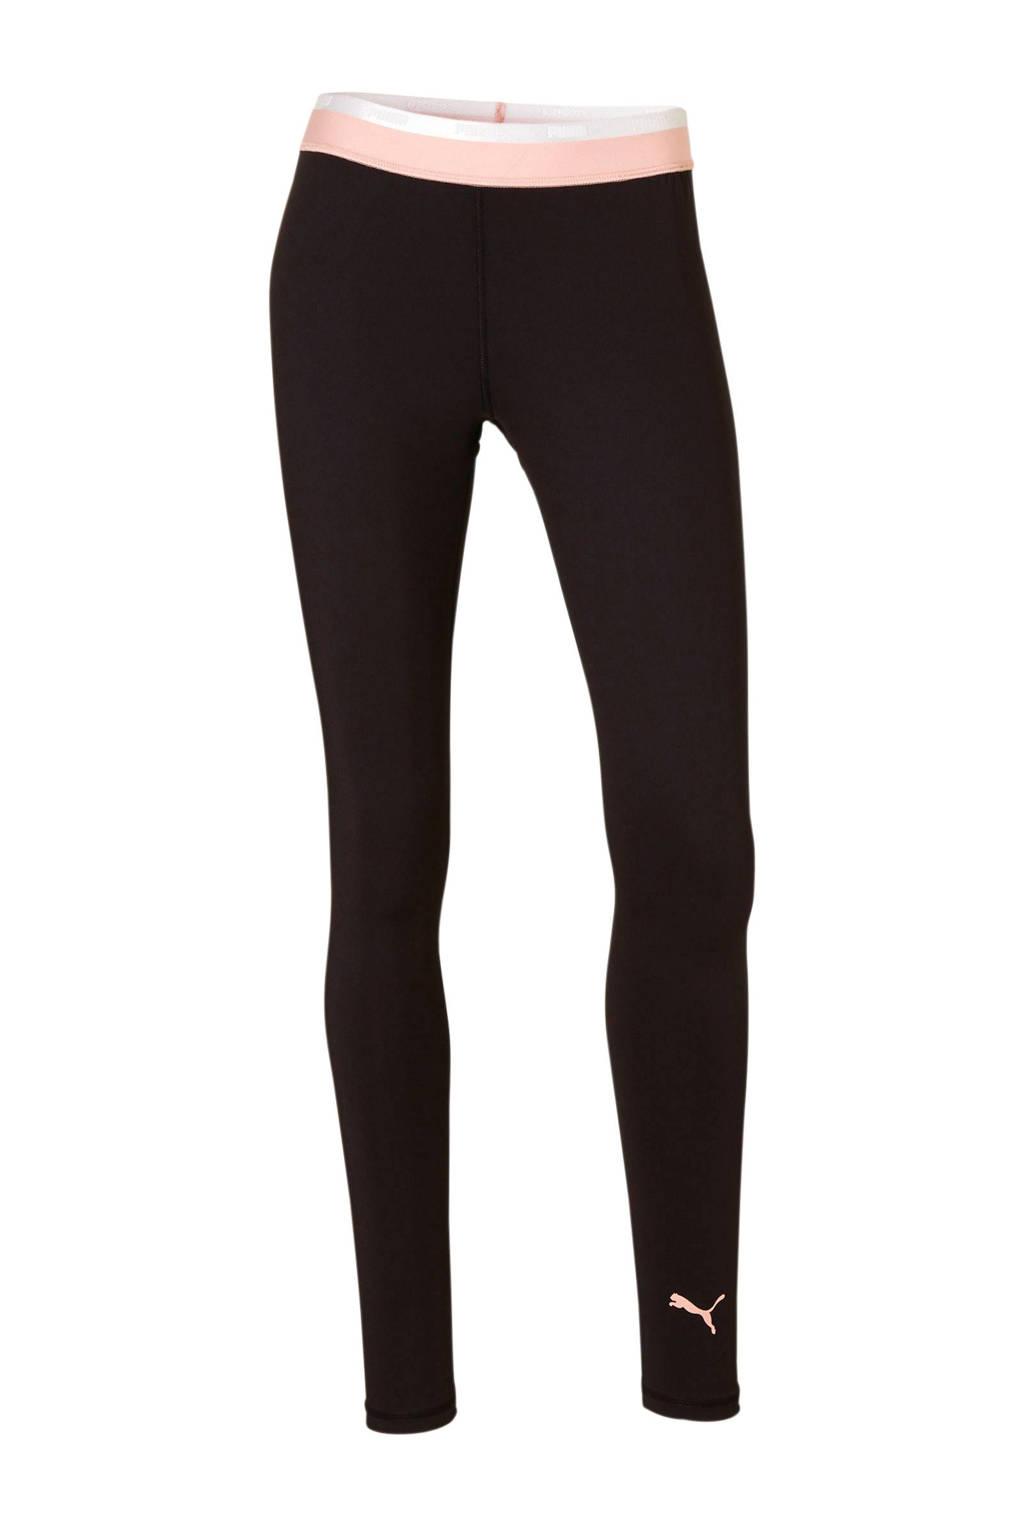 Puma 7/8 legging zwart, Zwart